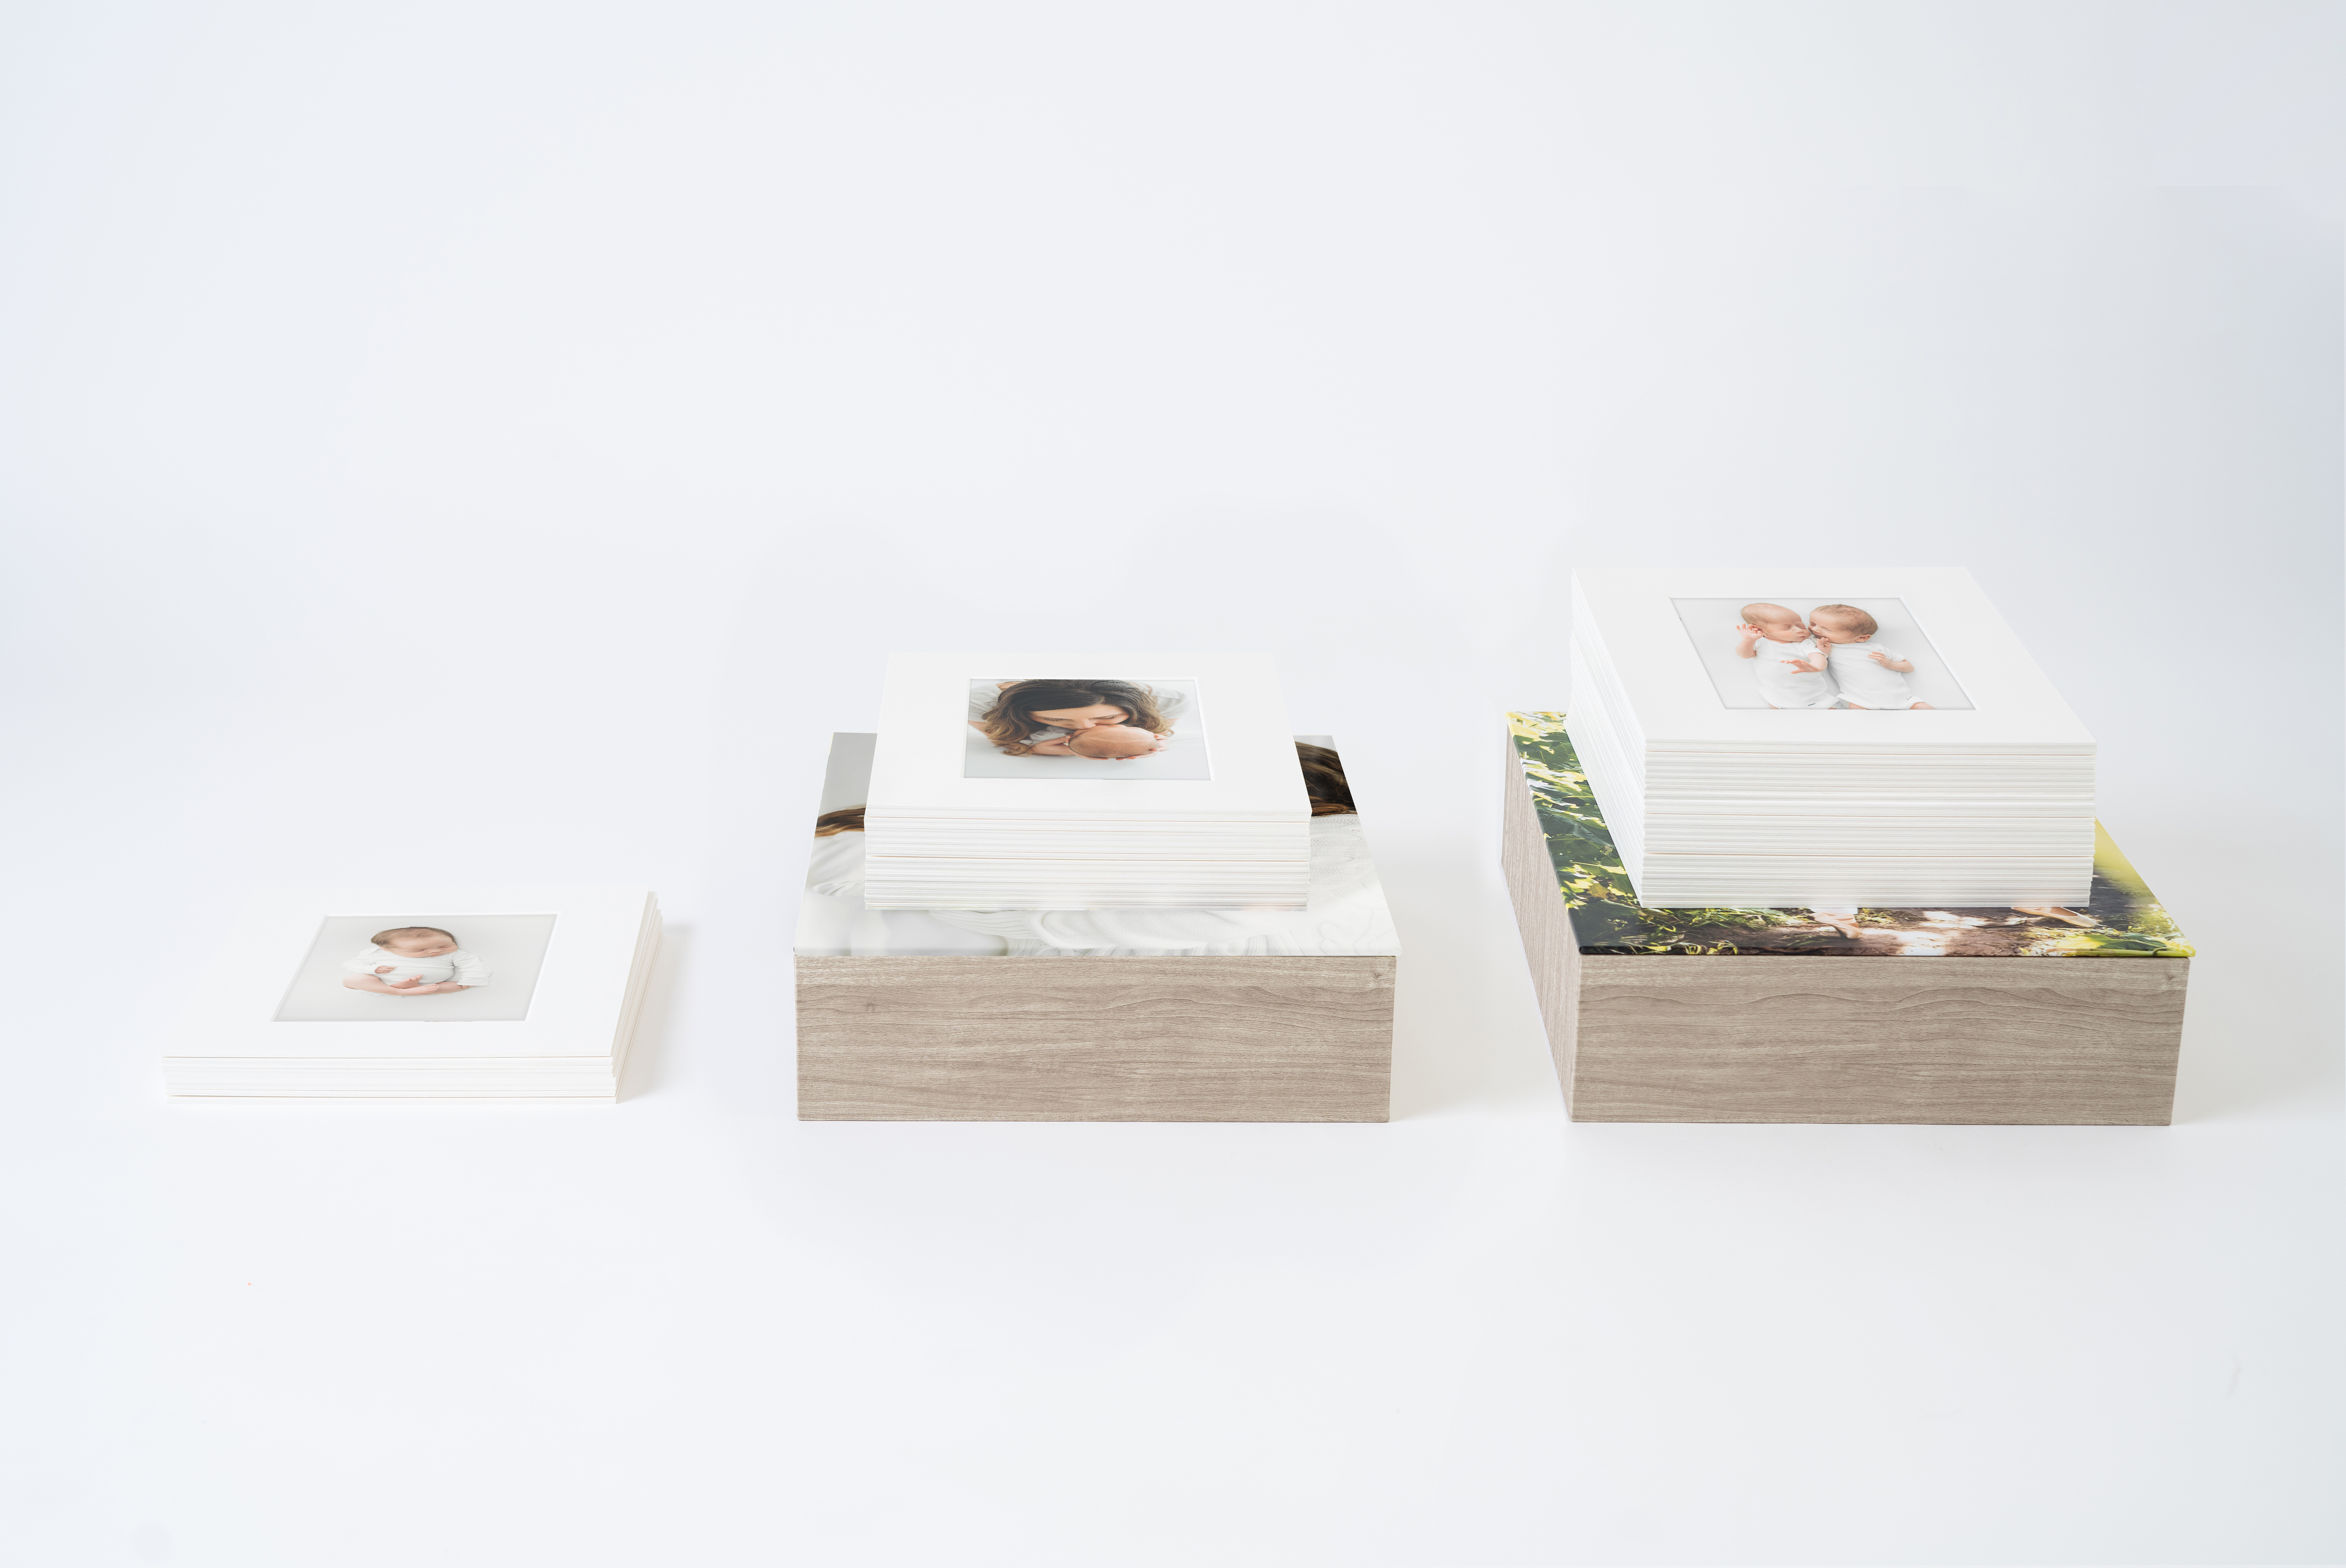 Studio-Products-folio-boxes-newborn